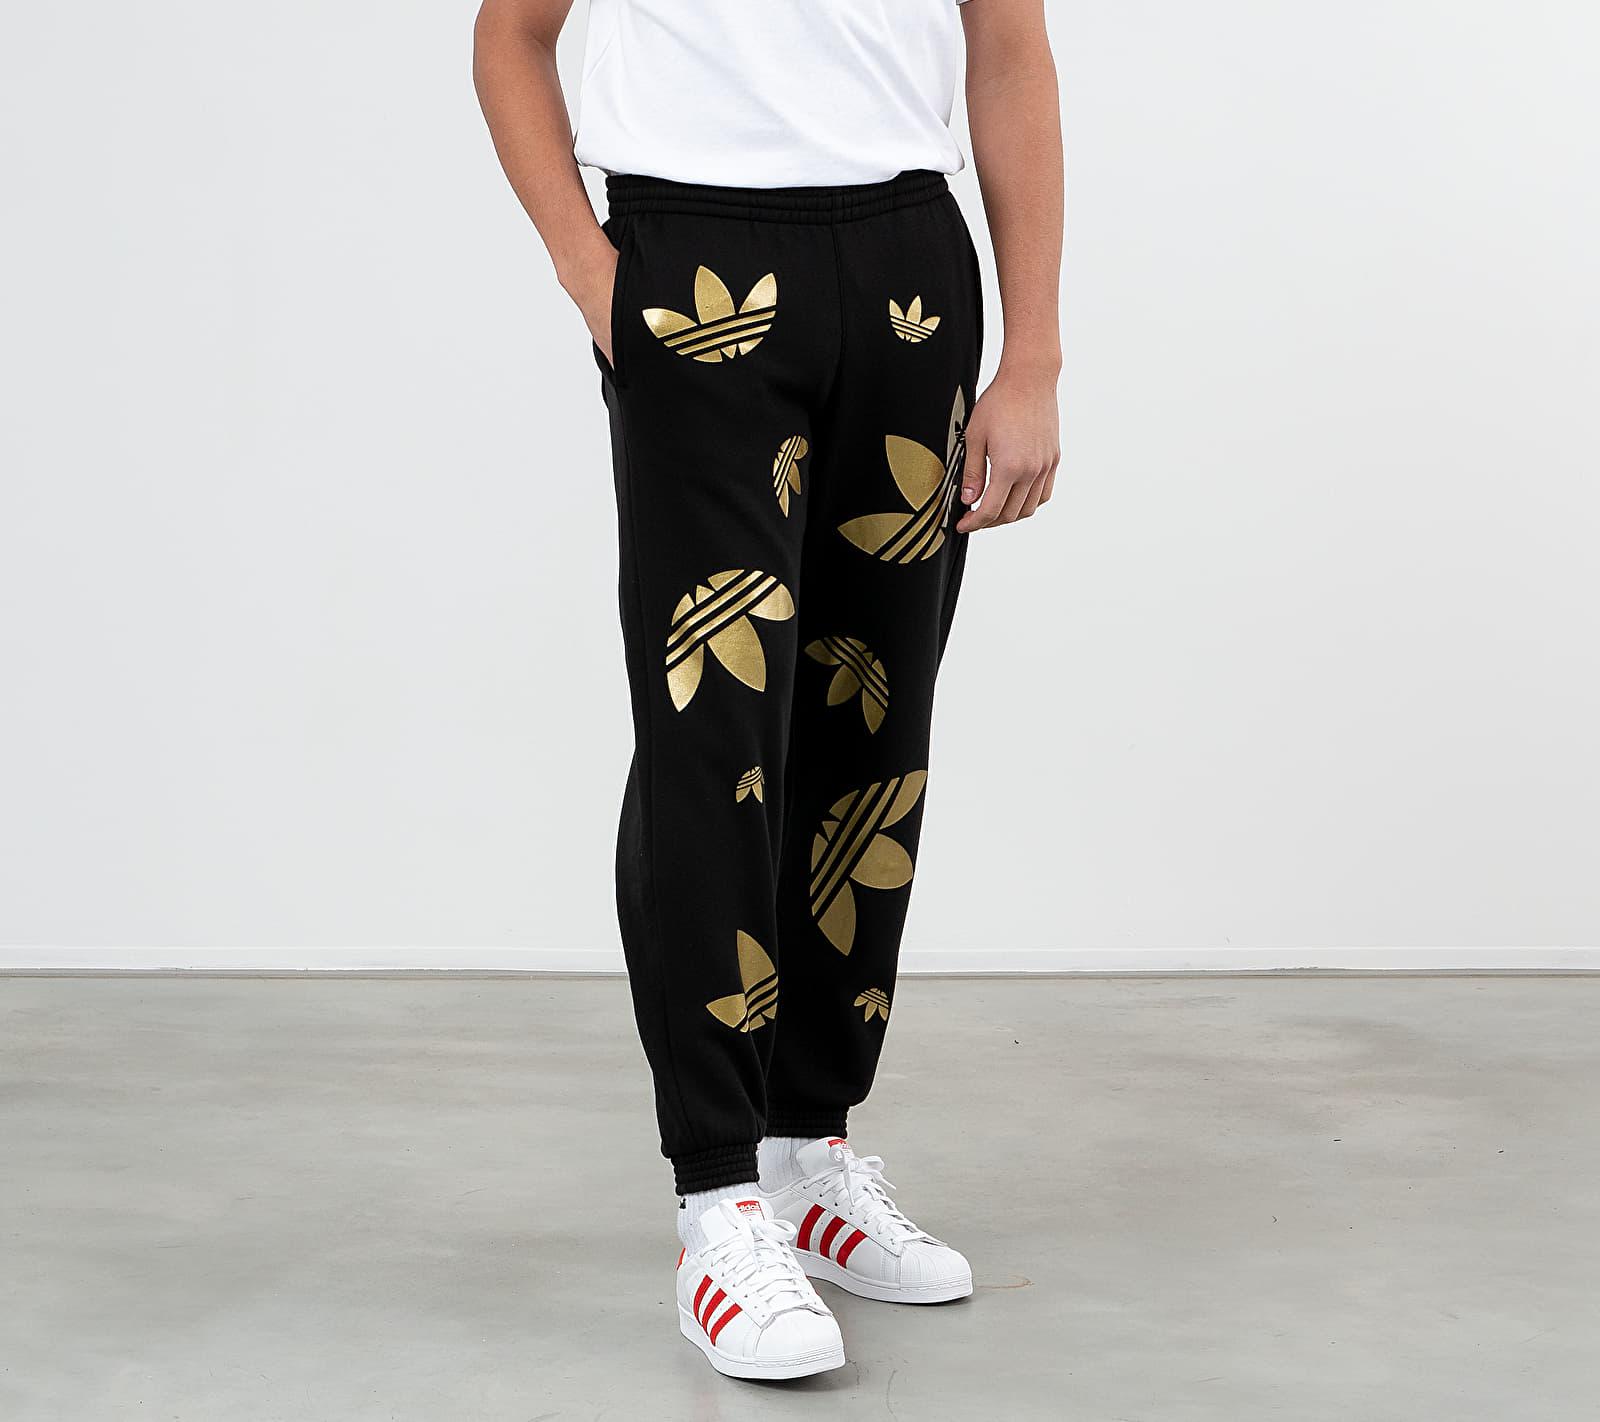 adidas pants reflective